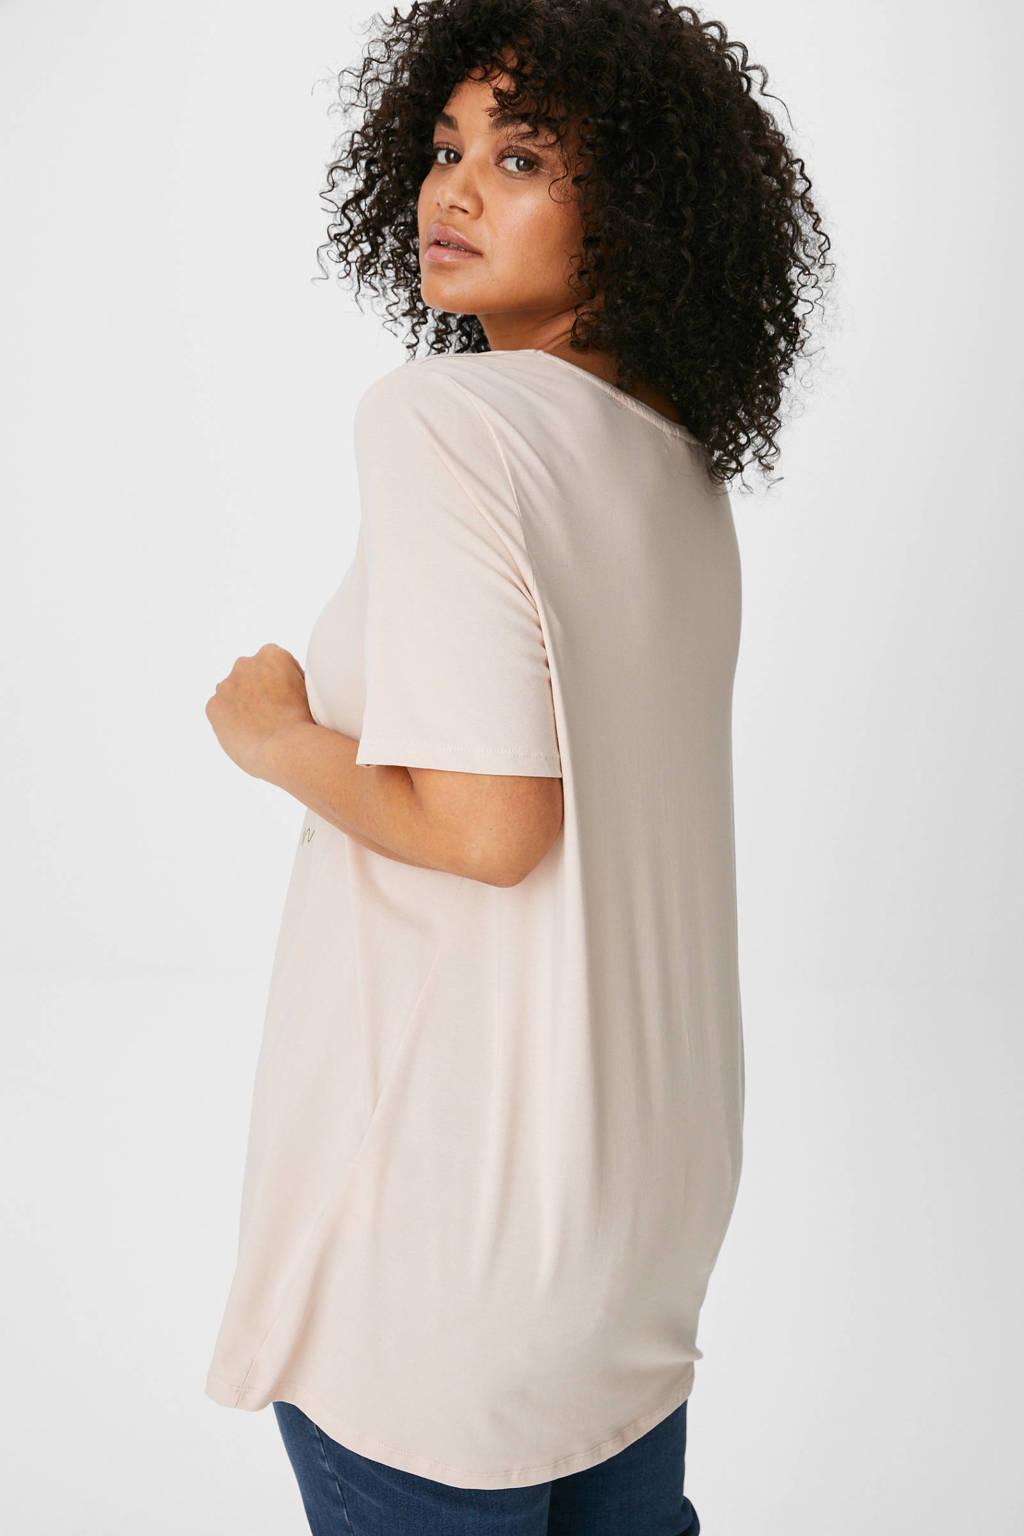 C&A XL Yessica T-shirt met biologisch katoen lichtroze, Lichtroze